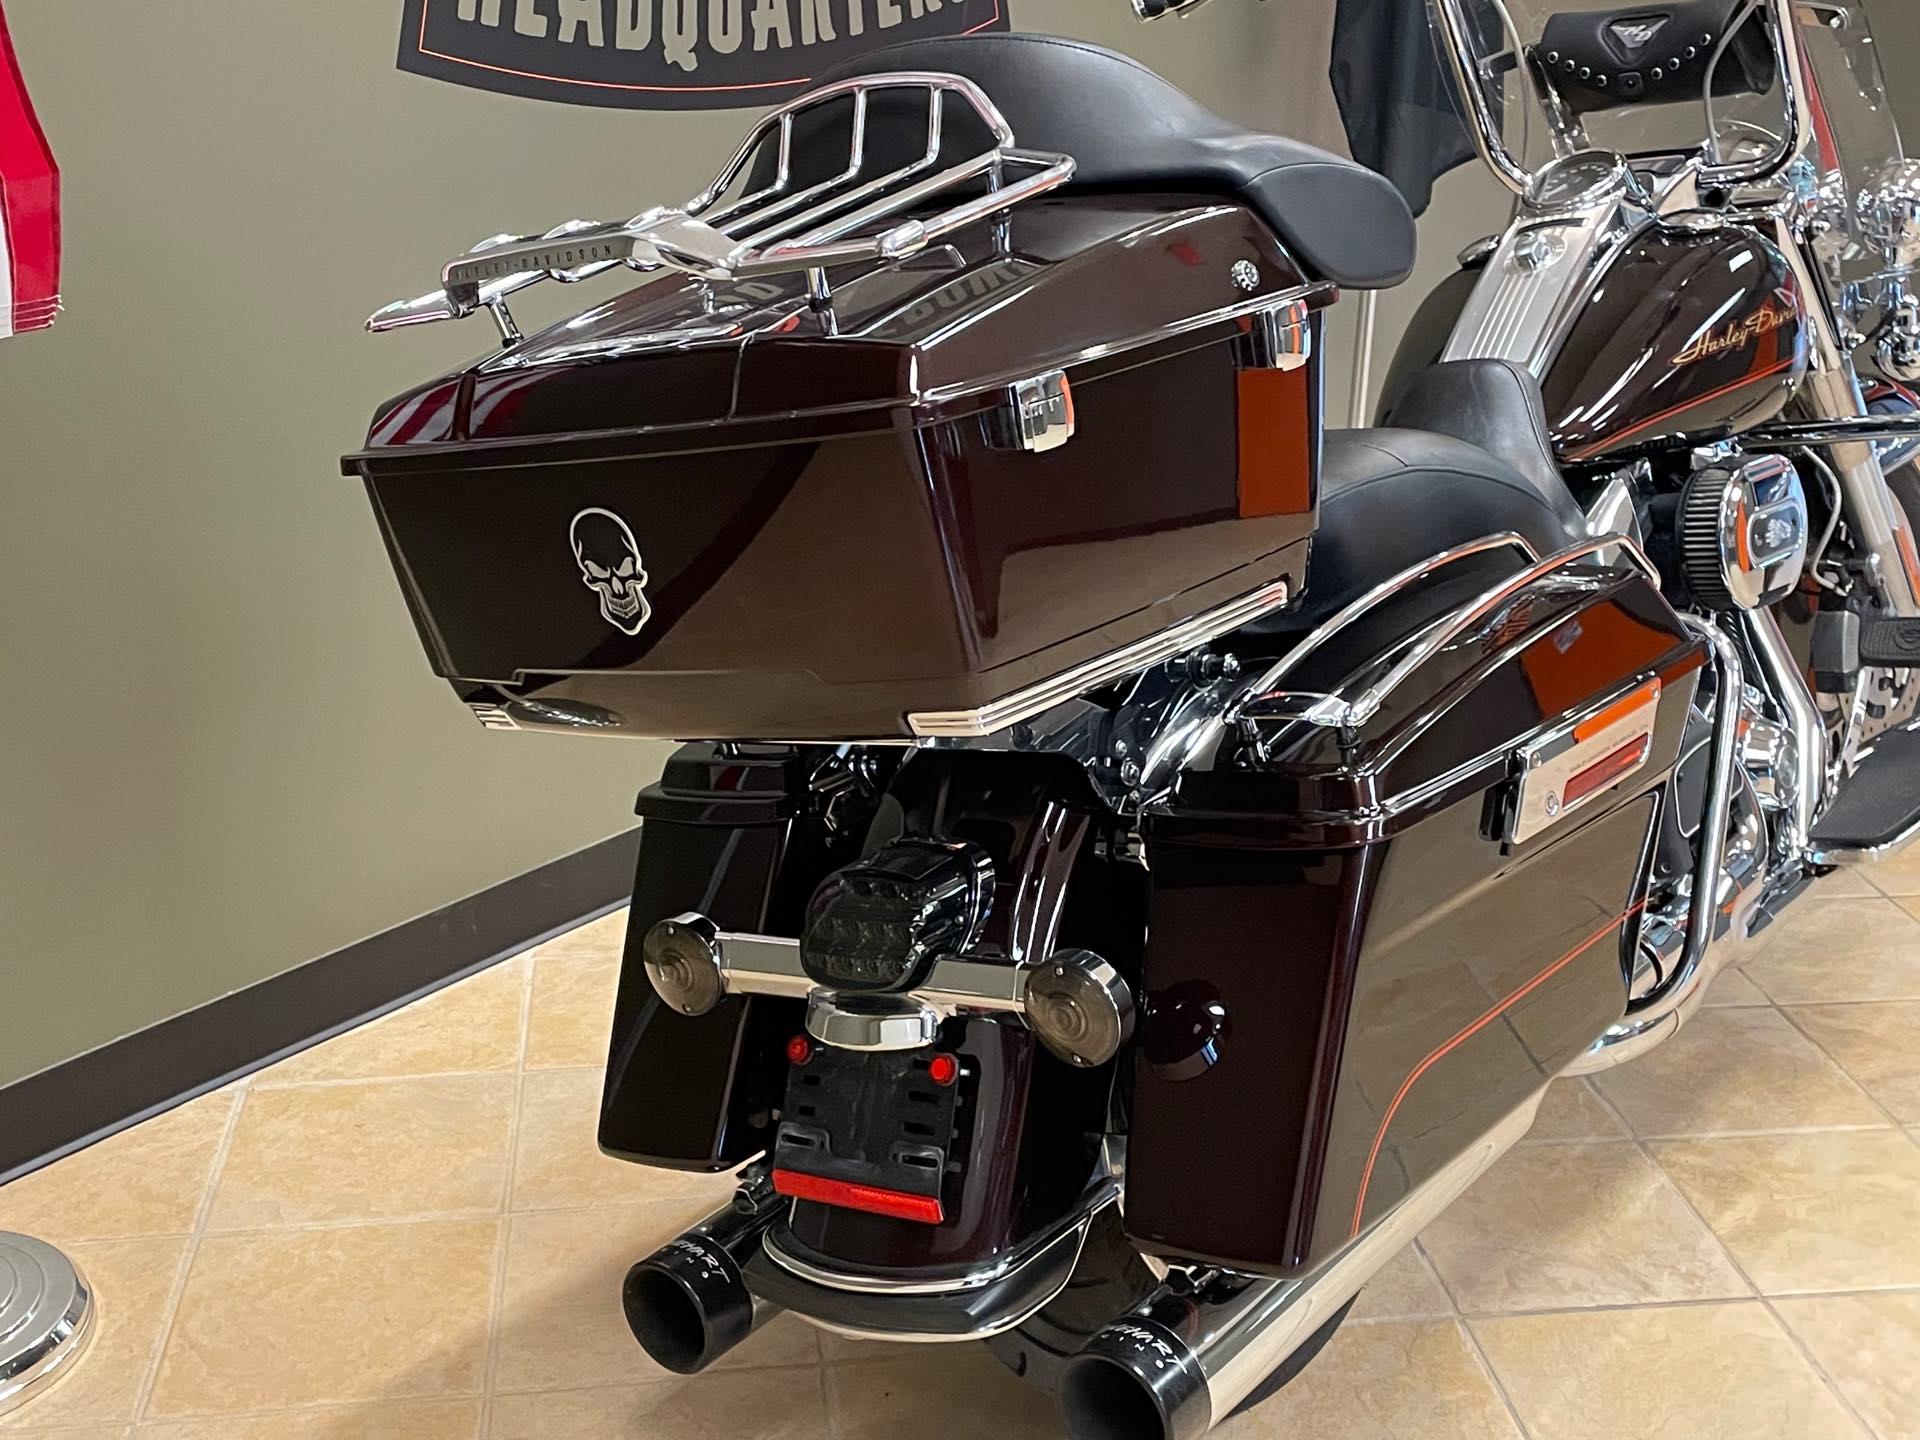 2011 Harley-Davidson Road King Base at Loess Hills Harley-Davidson